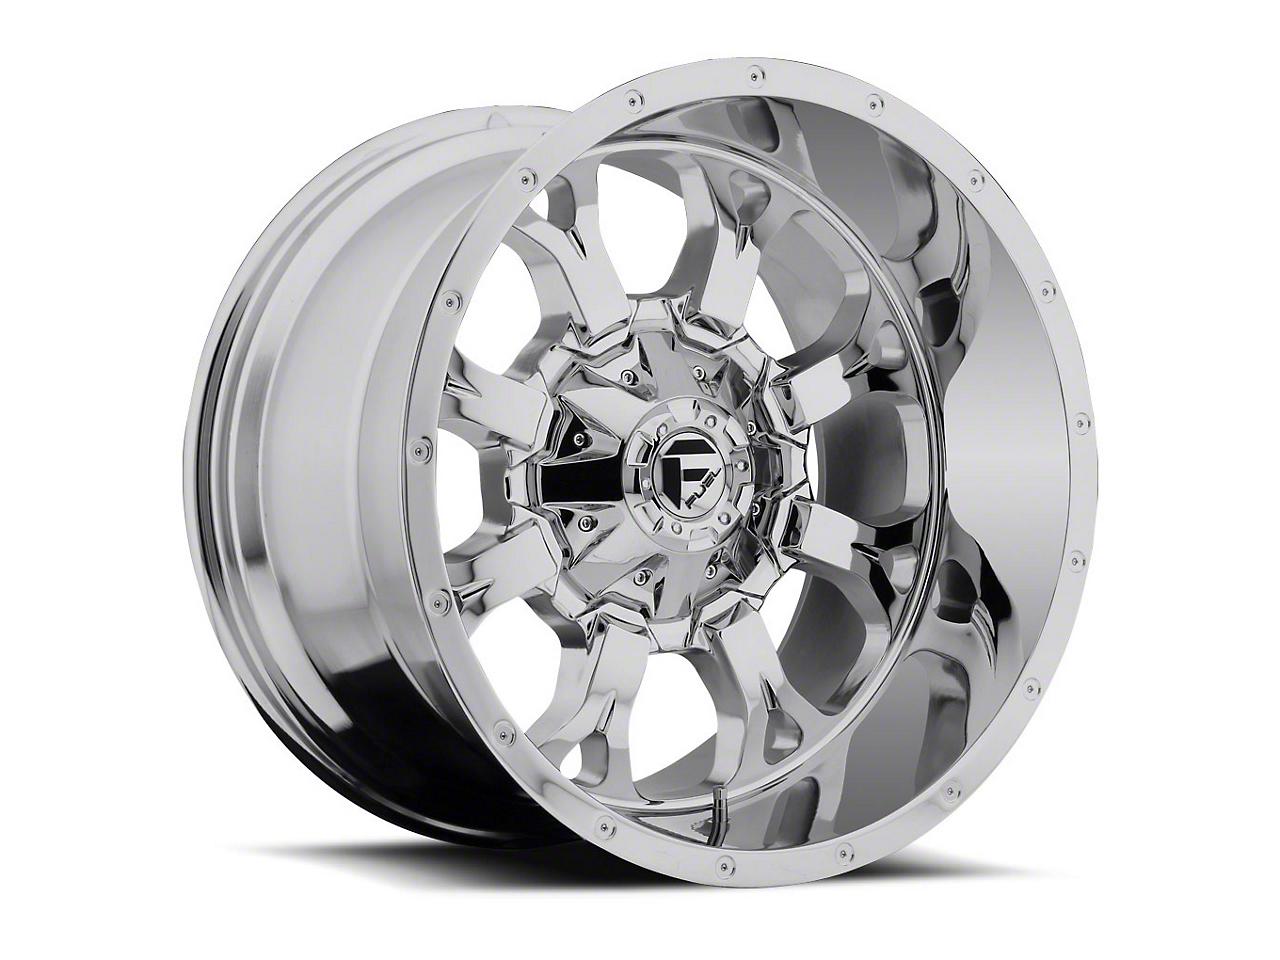 Fuel Wheels Krank Chrome 6-Lug Wheel - 20x9 (99-18 Silverado 1500)